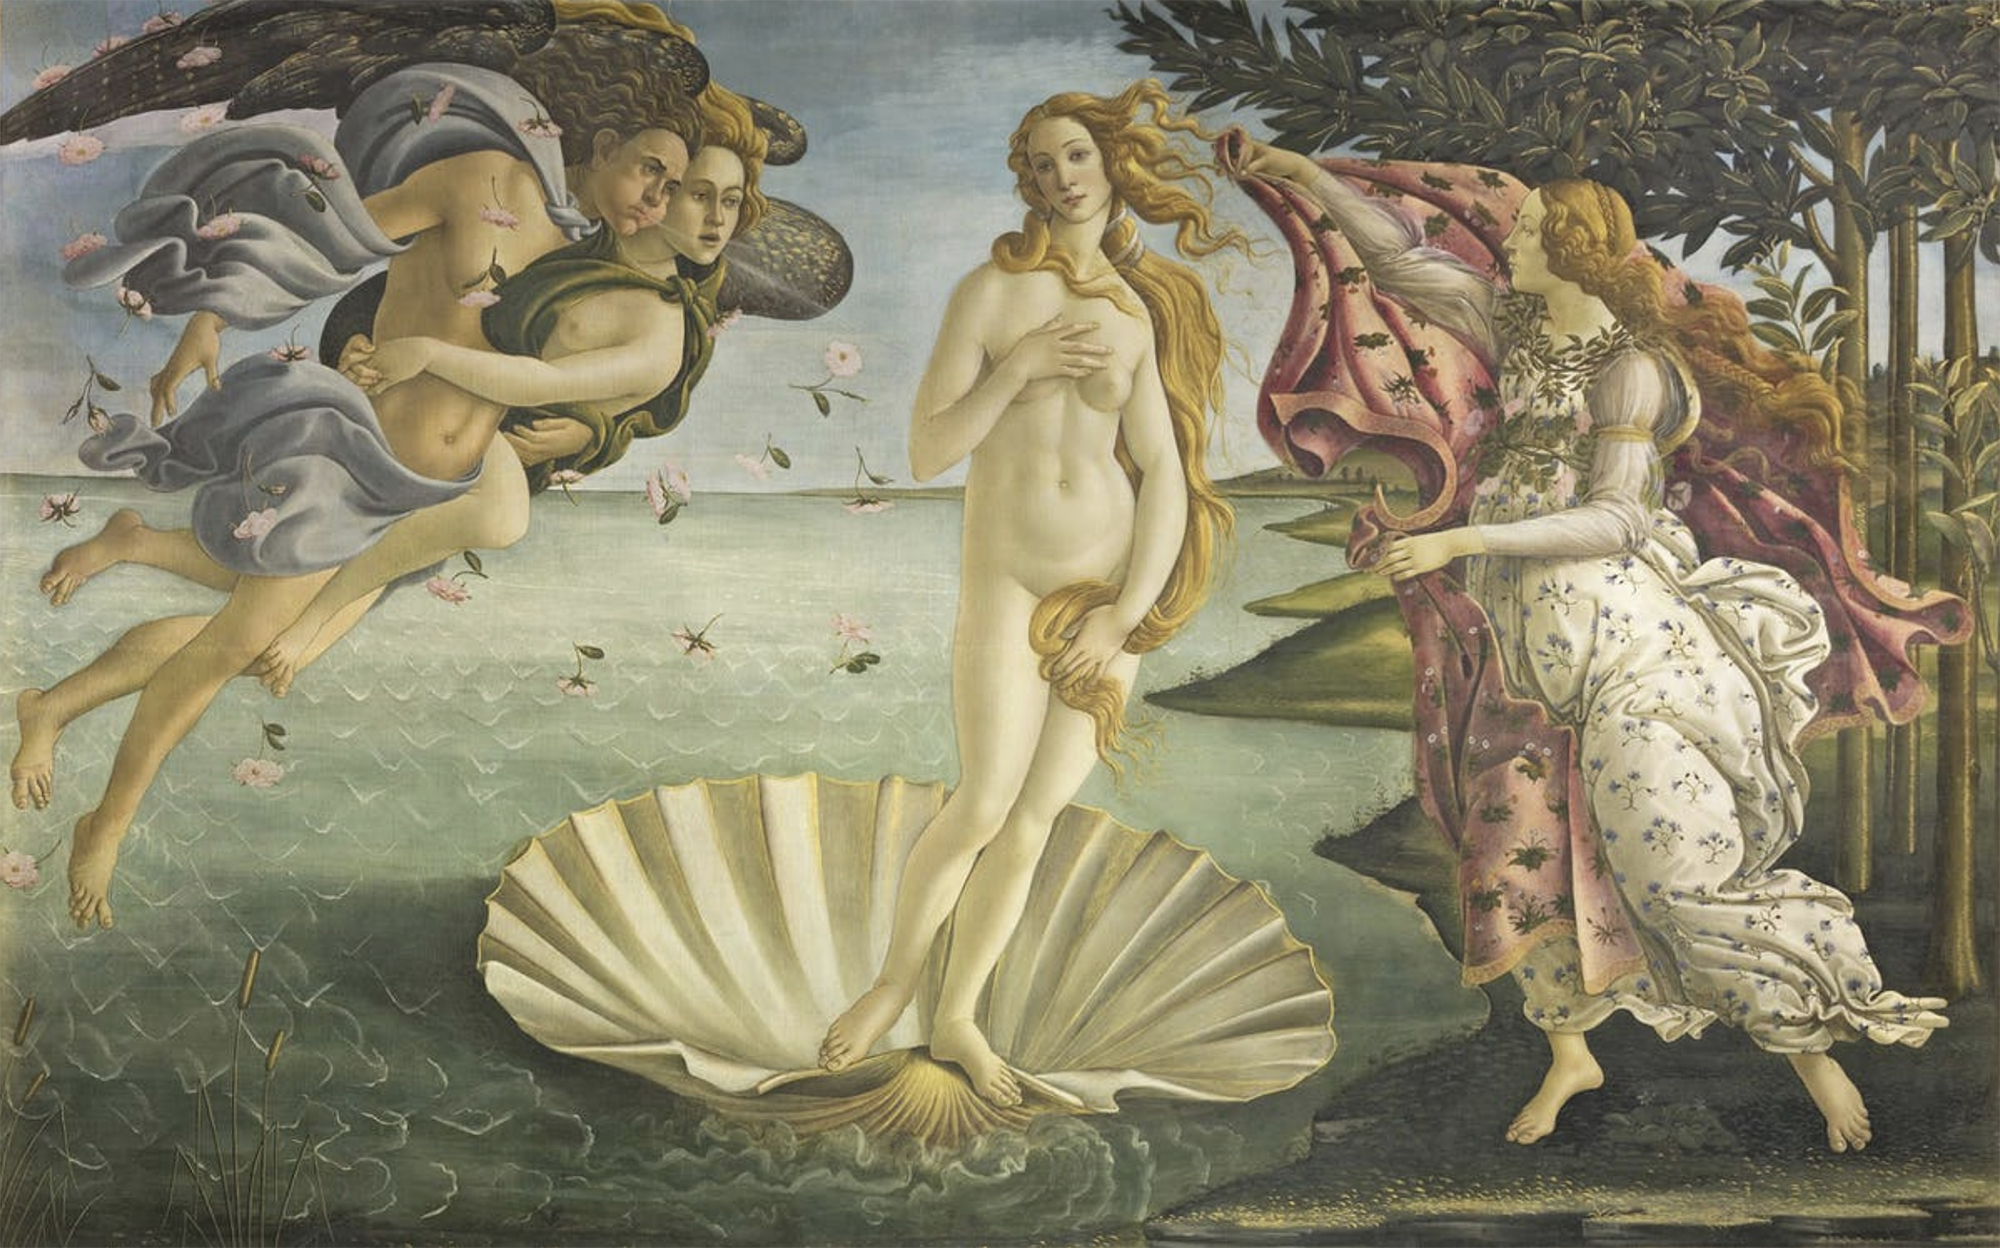 Cuadros famosos de mujeres desnudas